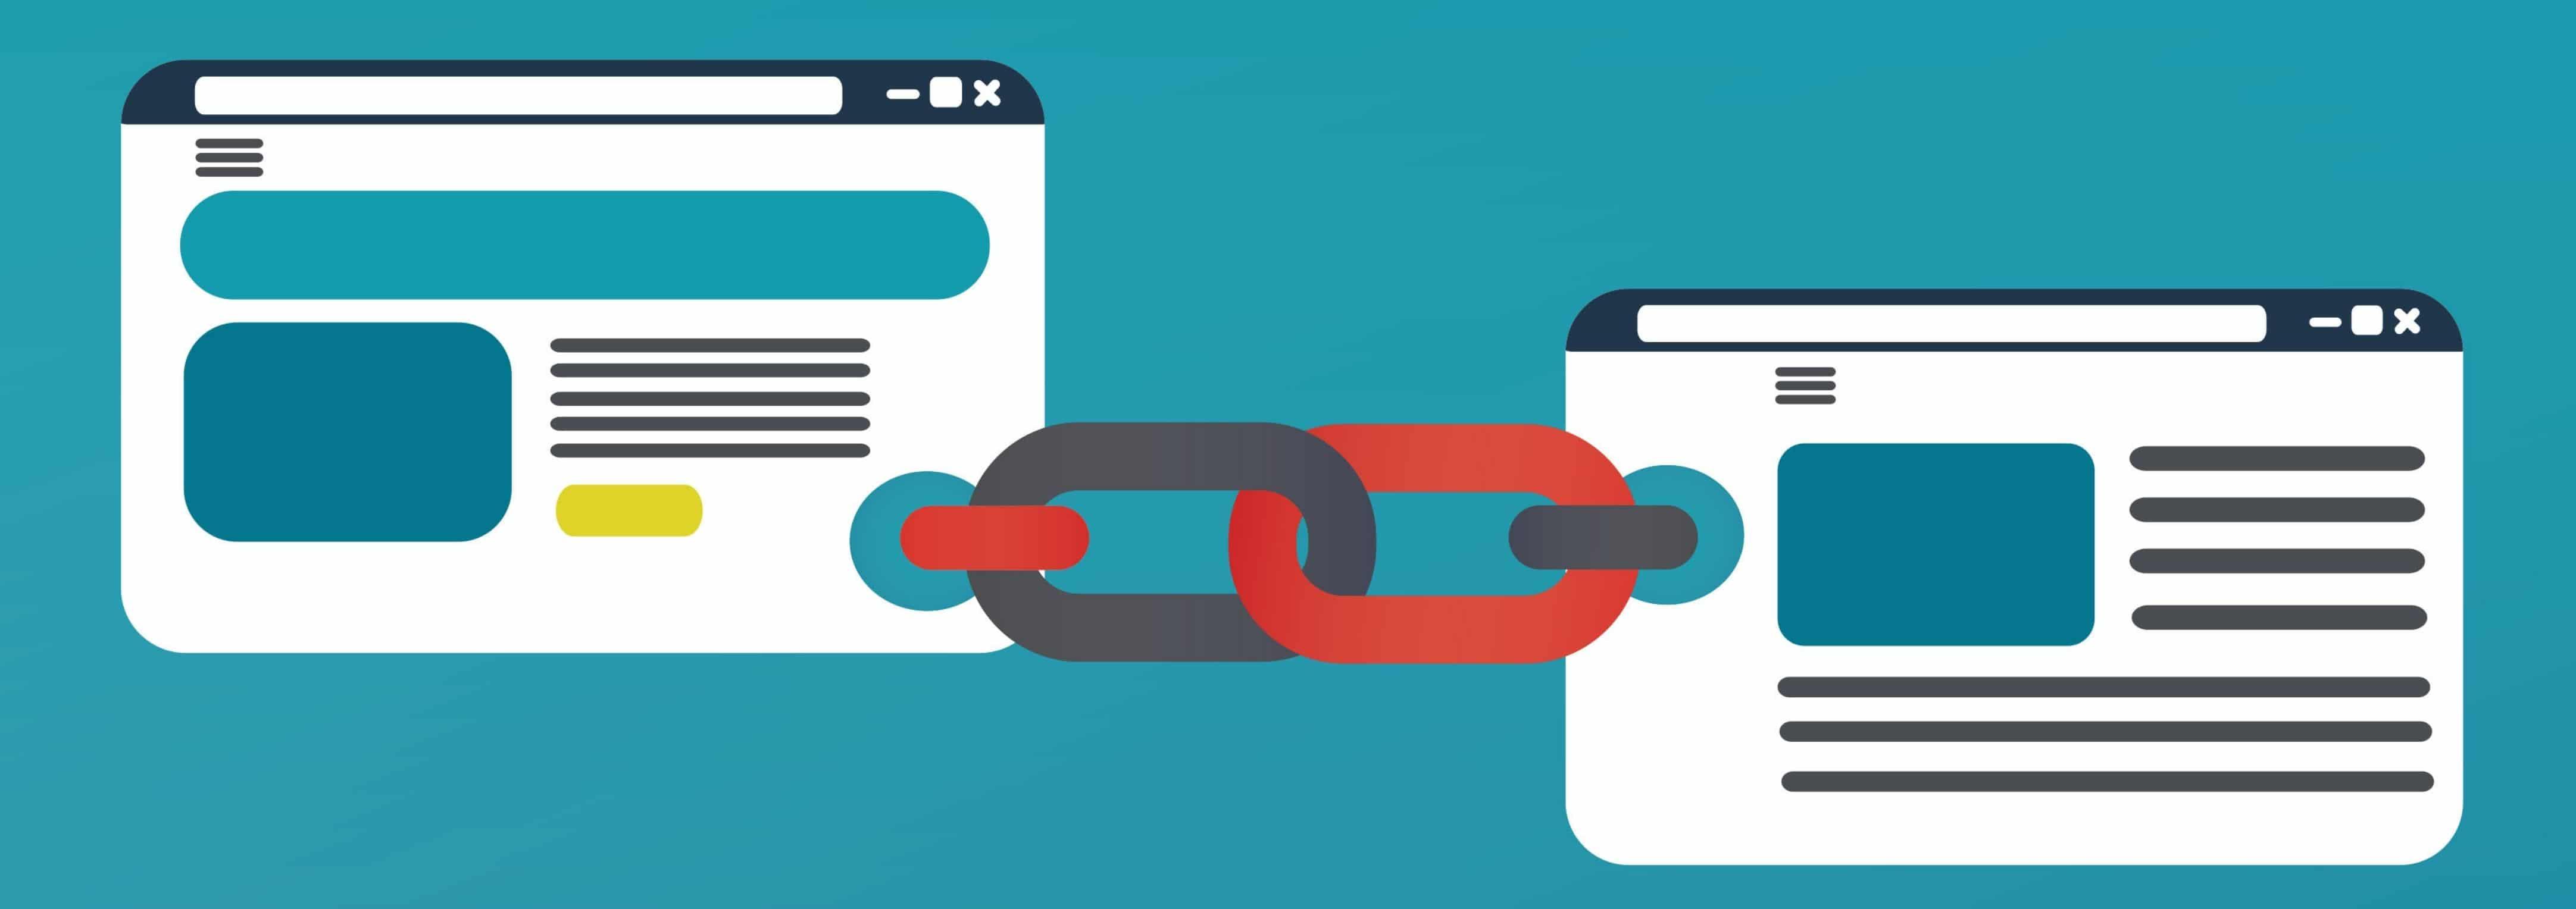 backlinking et netlinking par Searchbooster